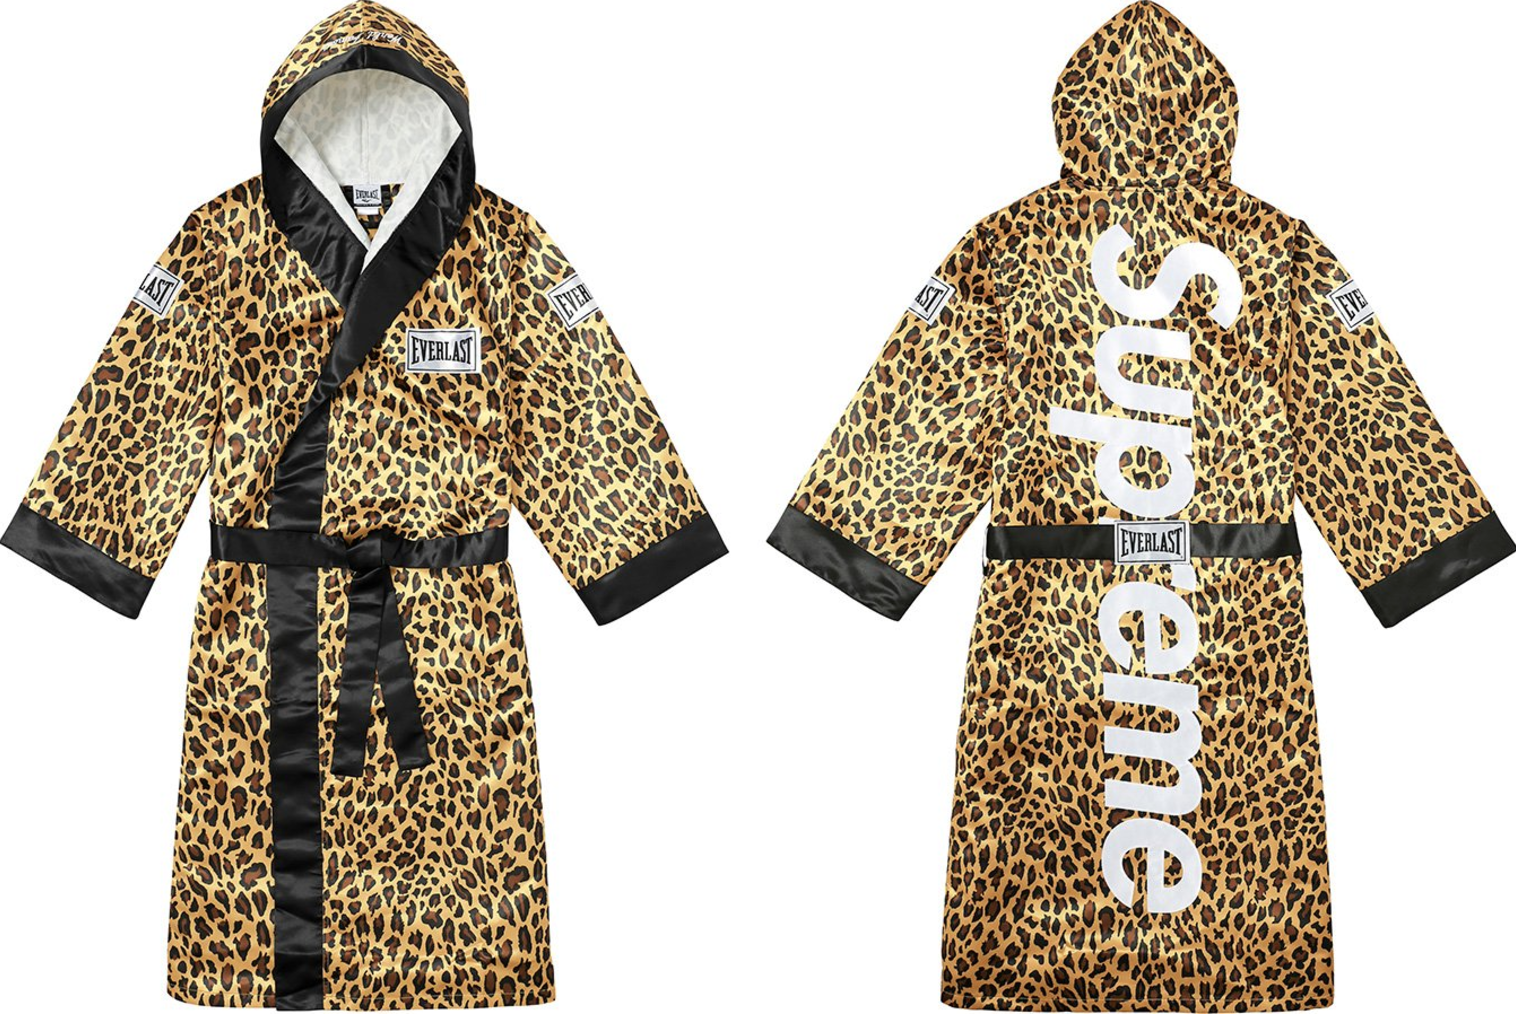 supreme-accessoires-trendsperiodical-04